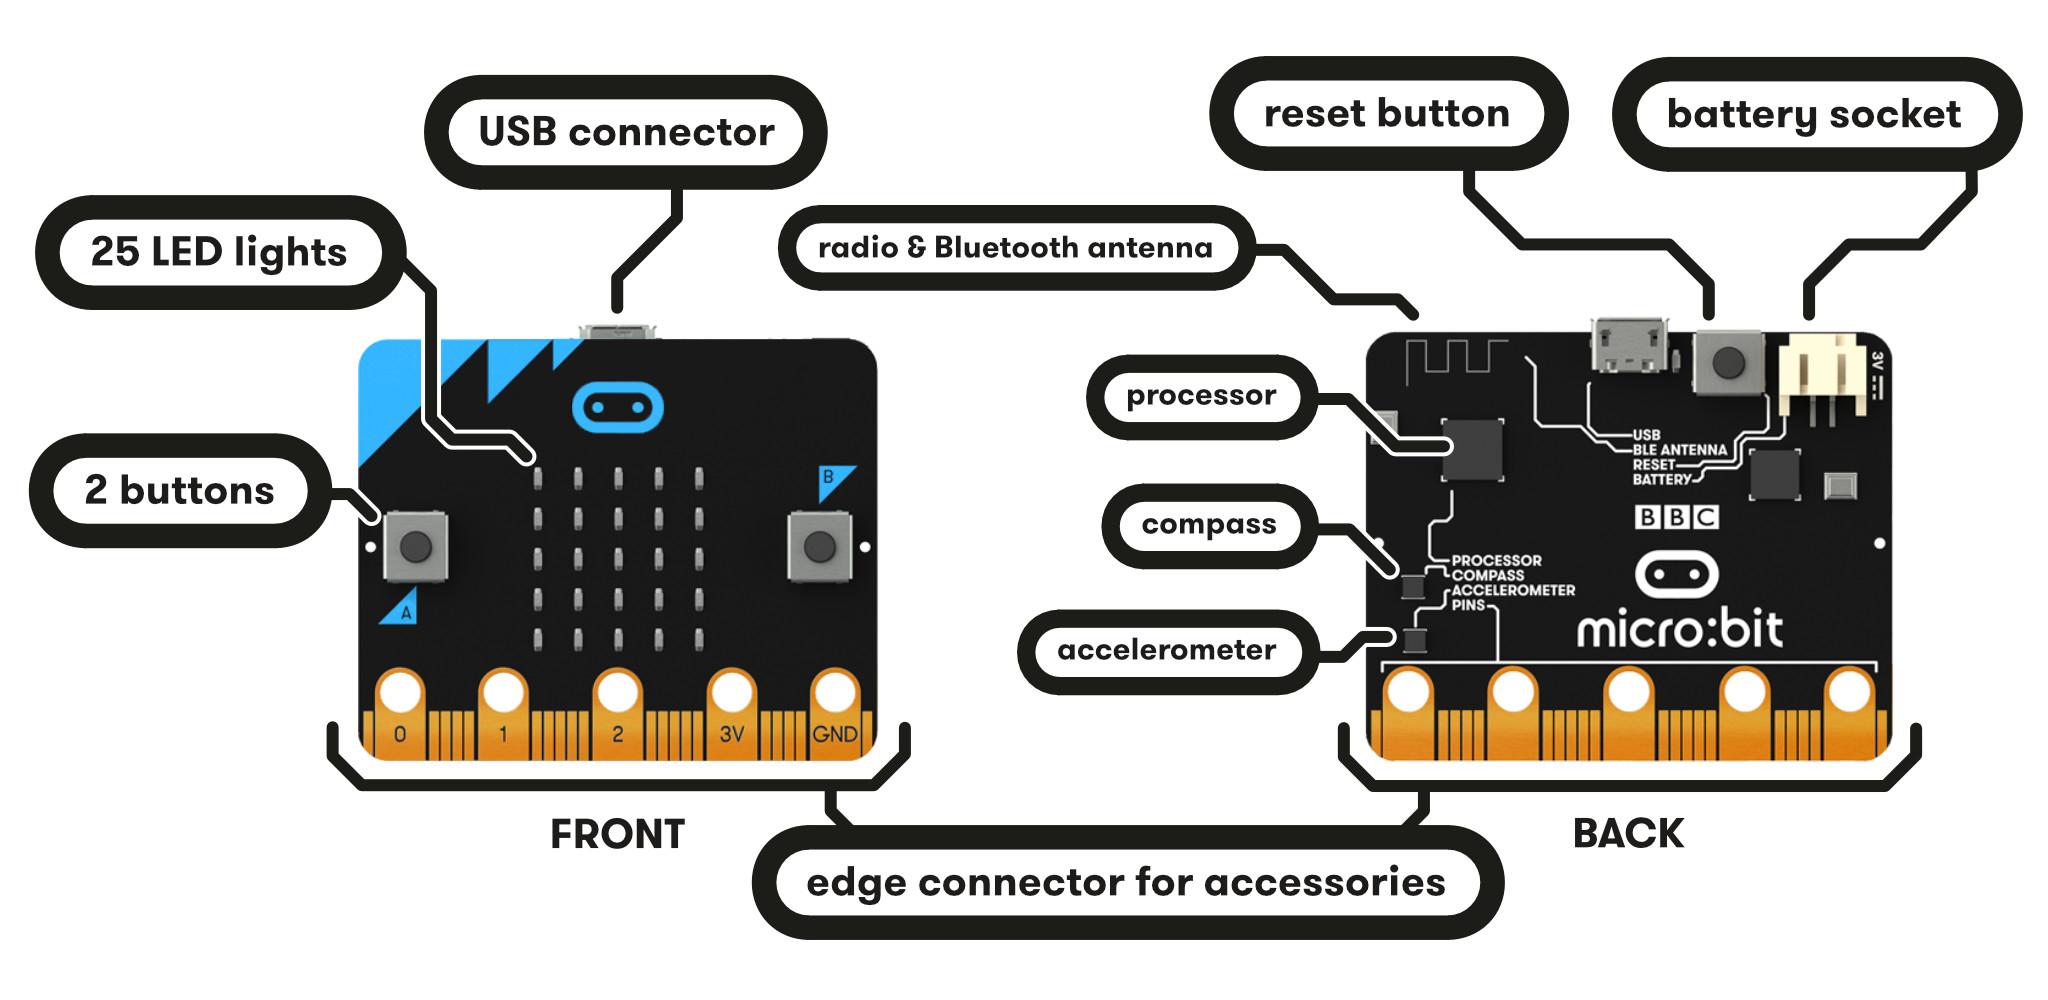 Micro:bit - Getting Started — UCL BBC micro:bit tutorial